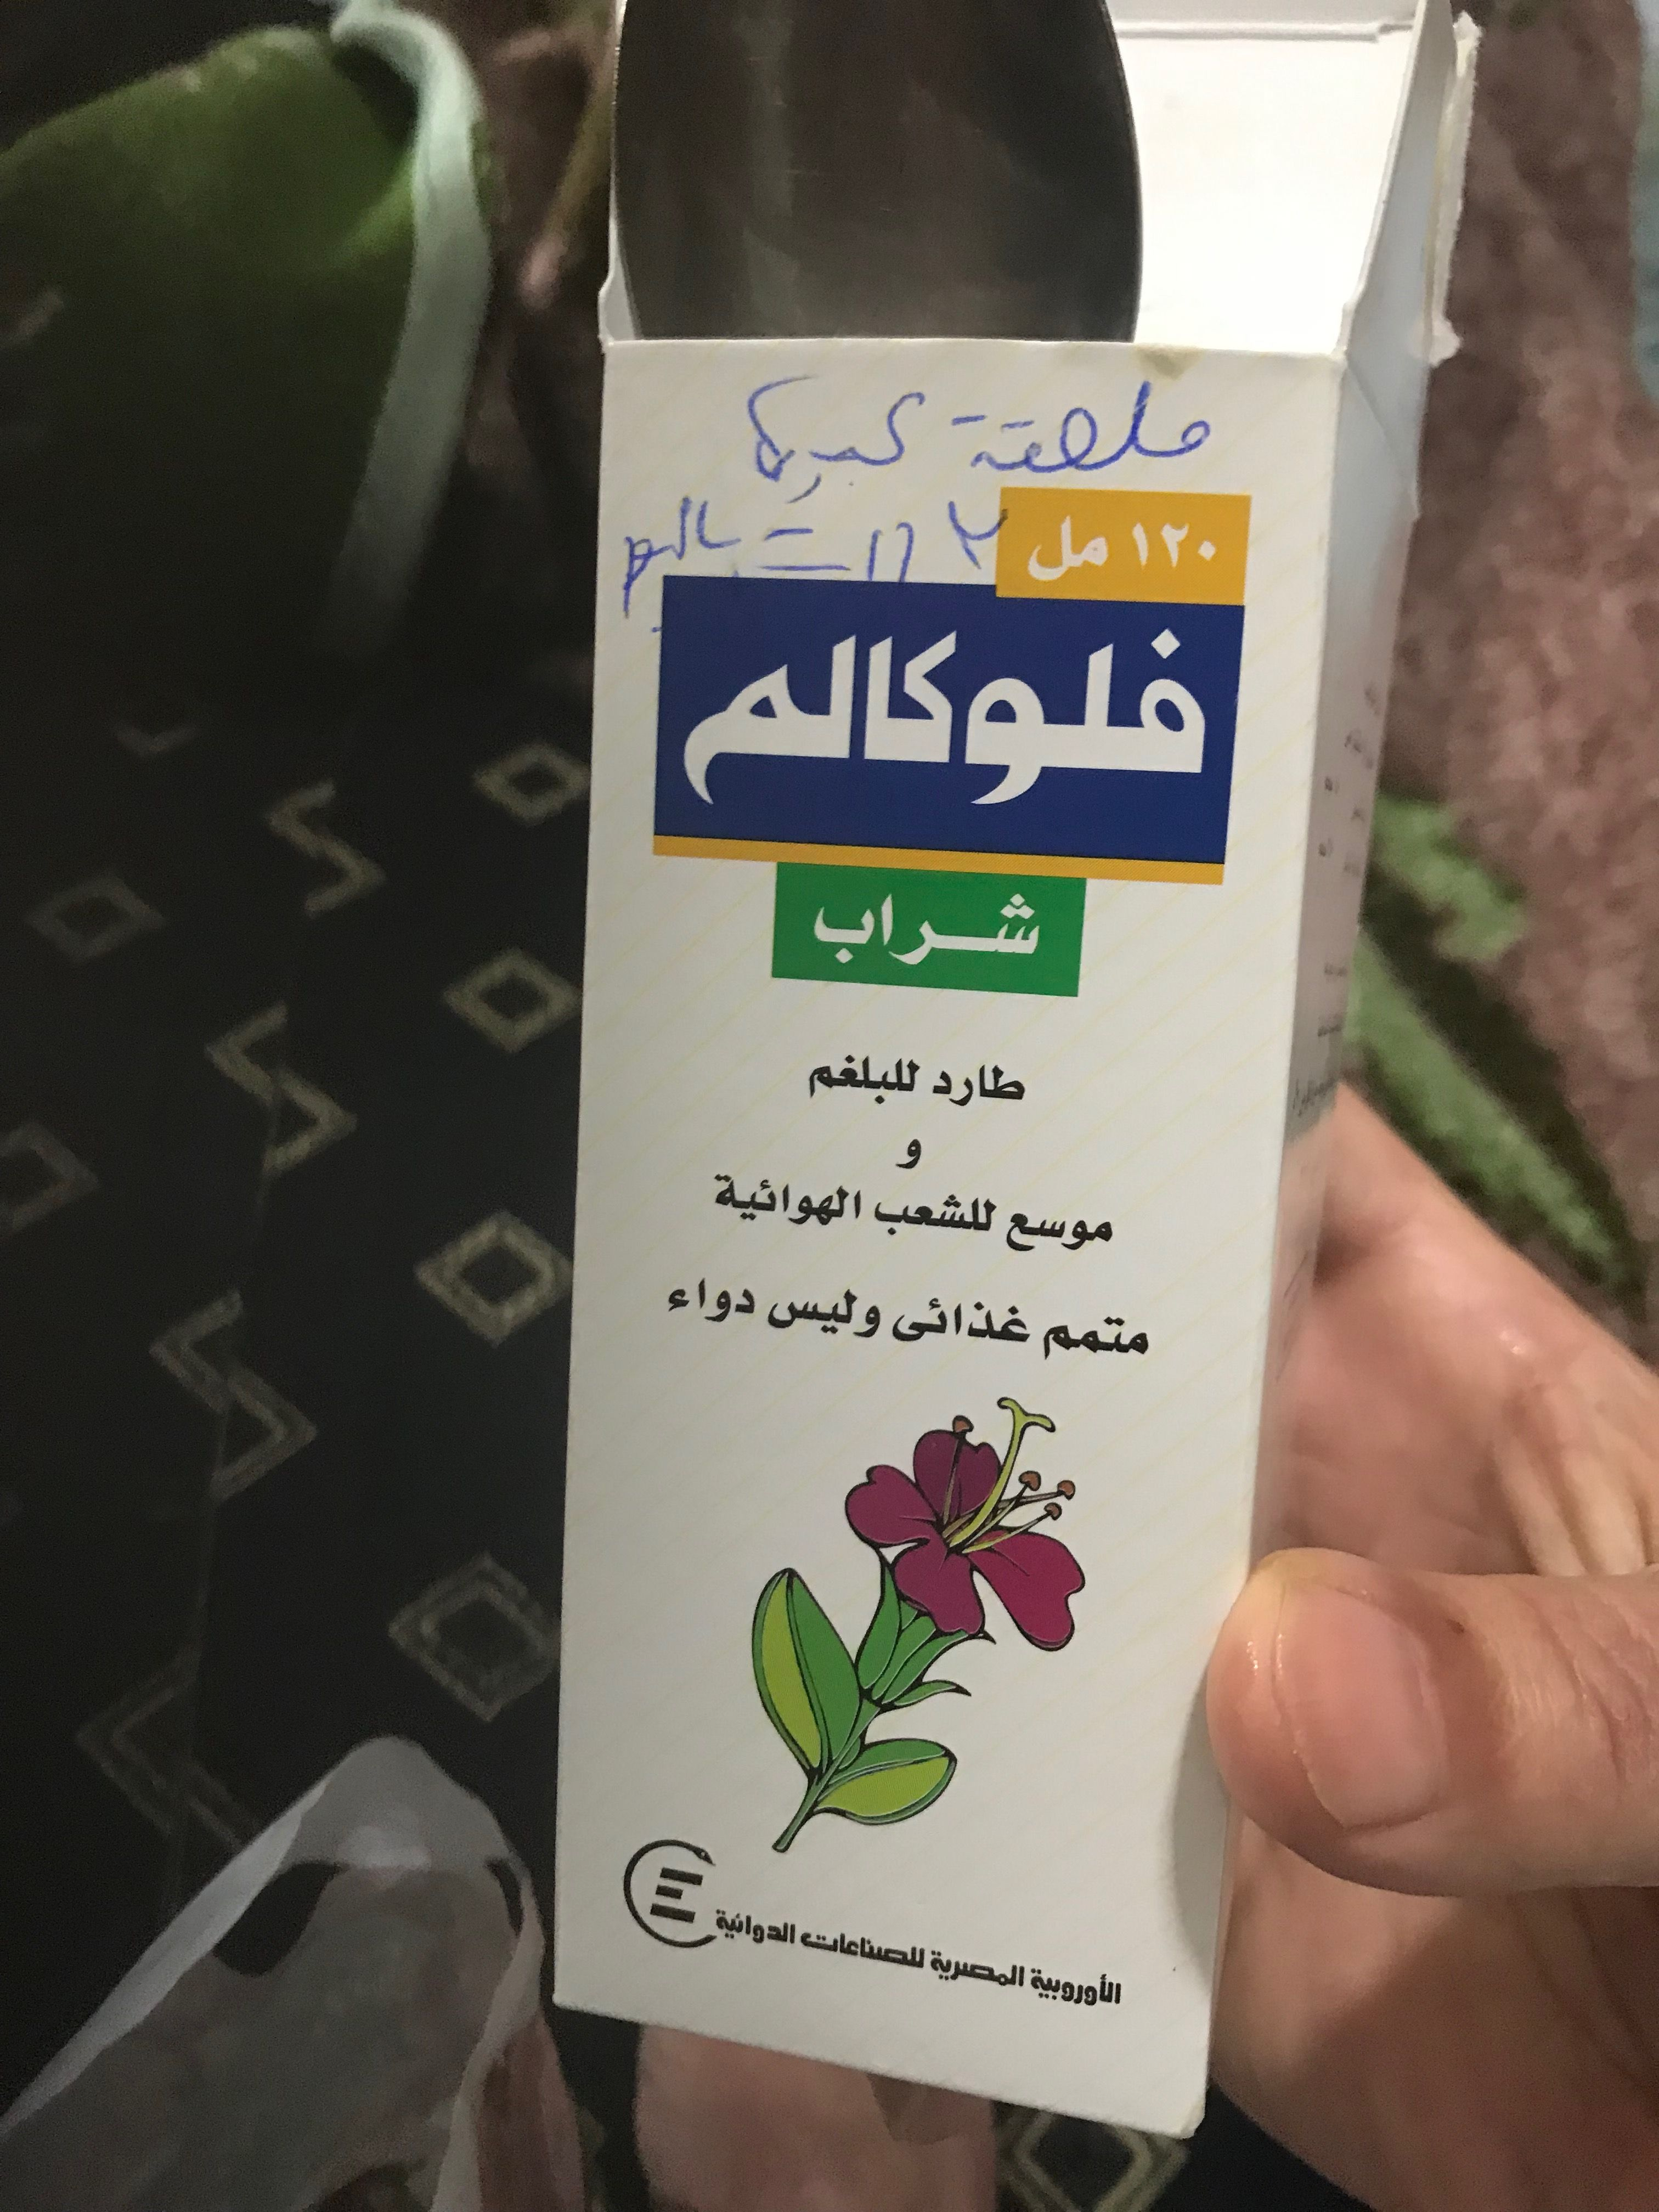 Pin By Abomohammad On نصائح ووصفات خاصة Drinks Bottle